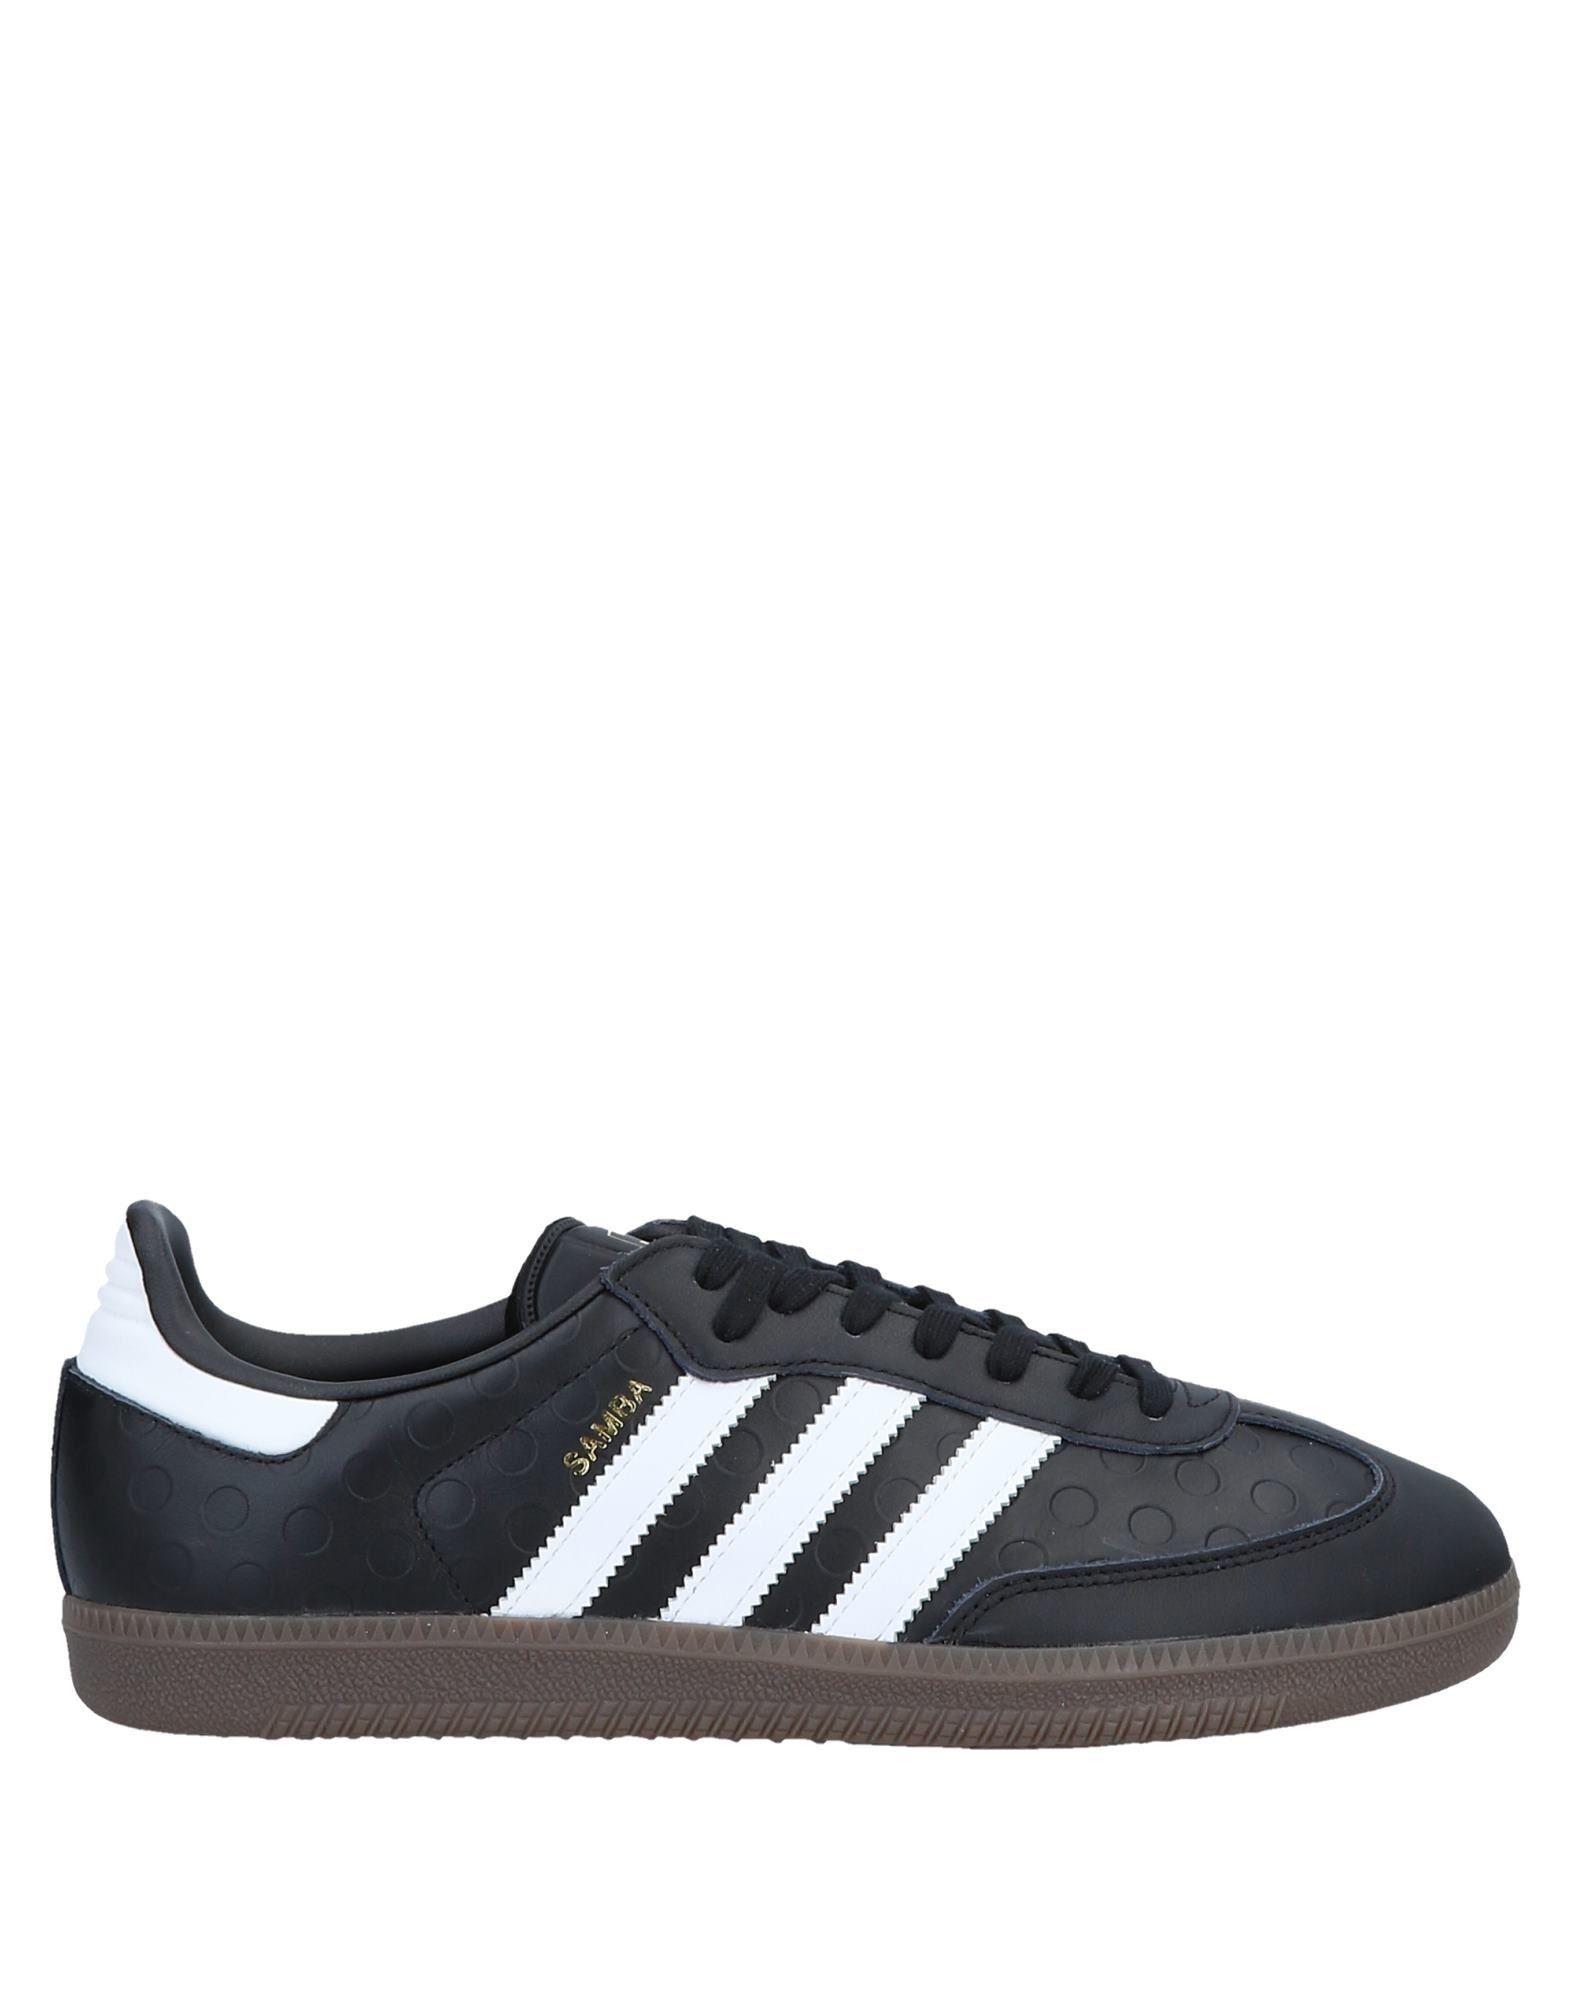 Adidas on Originals Sneakers - Women Adidas Originals Sneakers online on Adidas  Australia - 11563604DV e55e2d